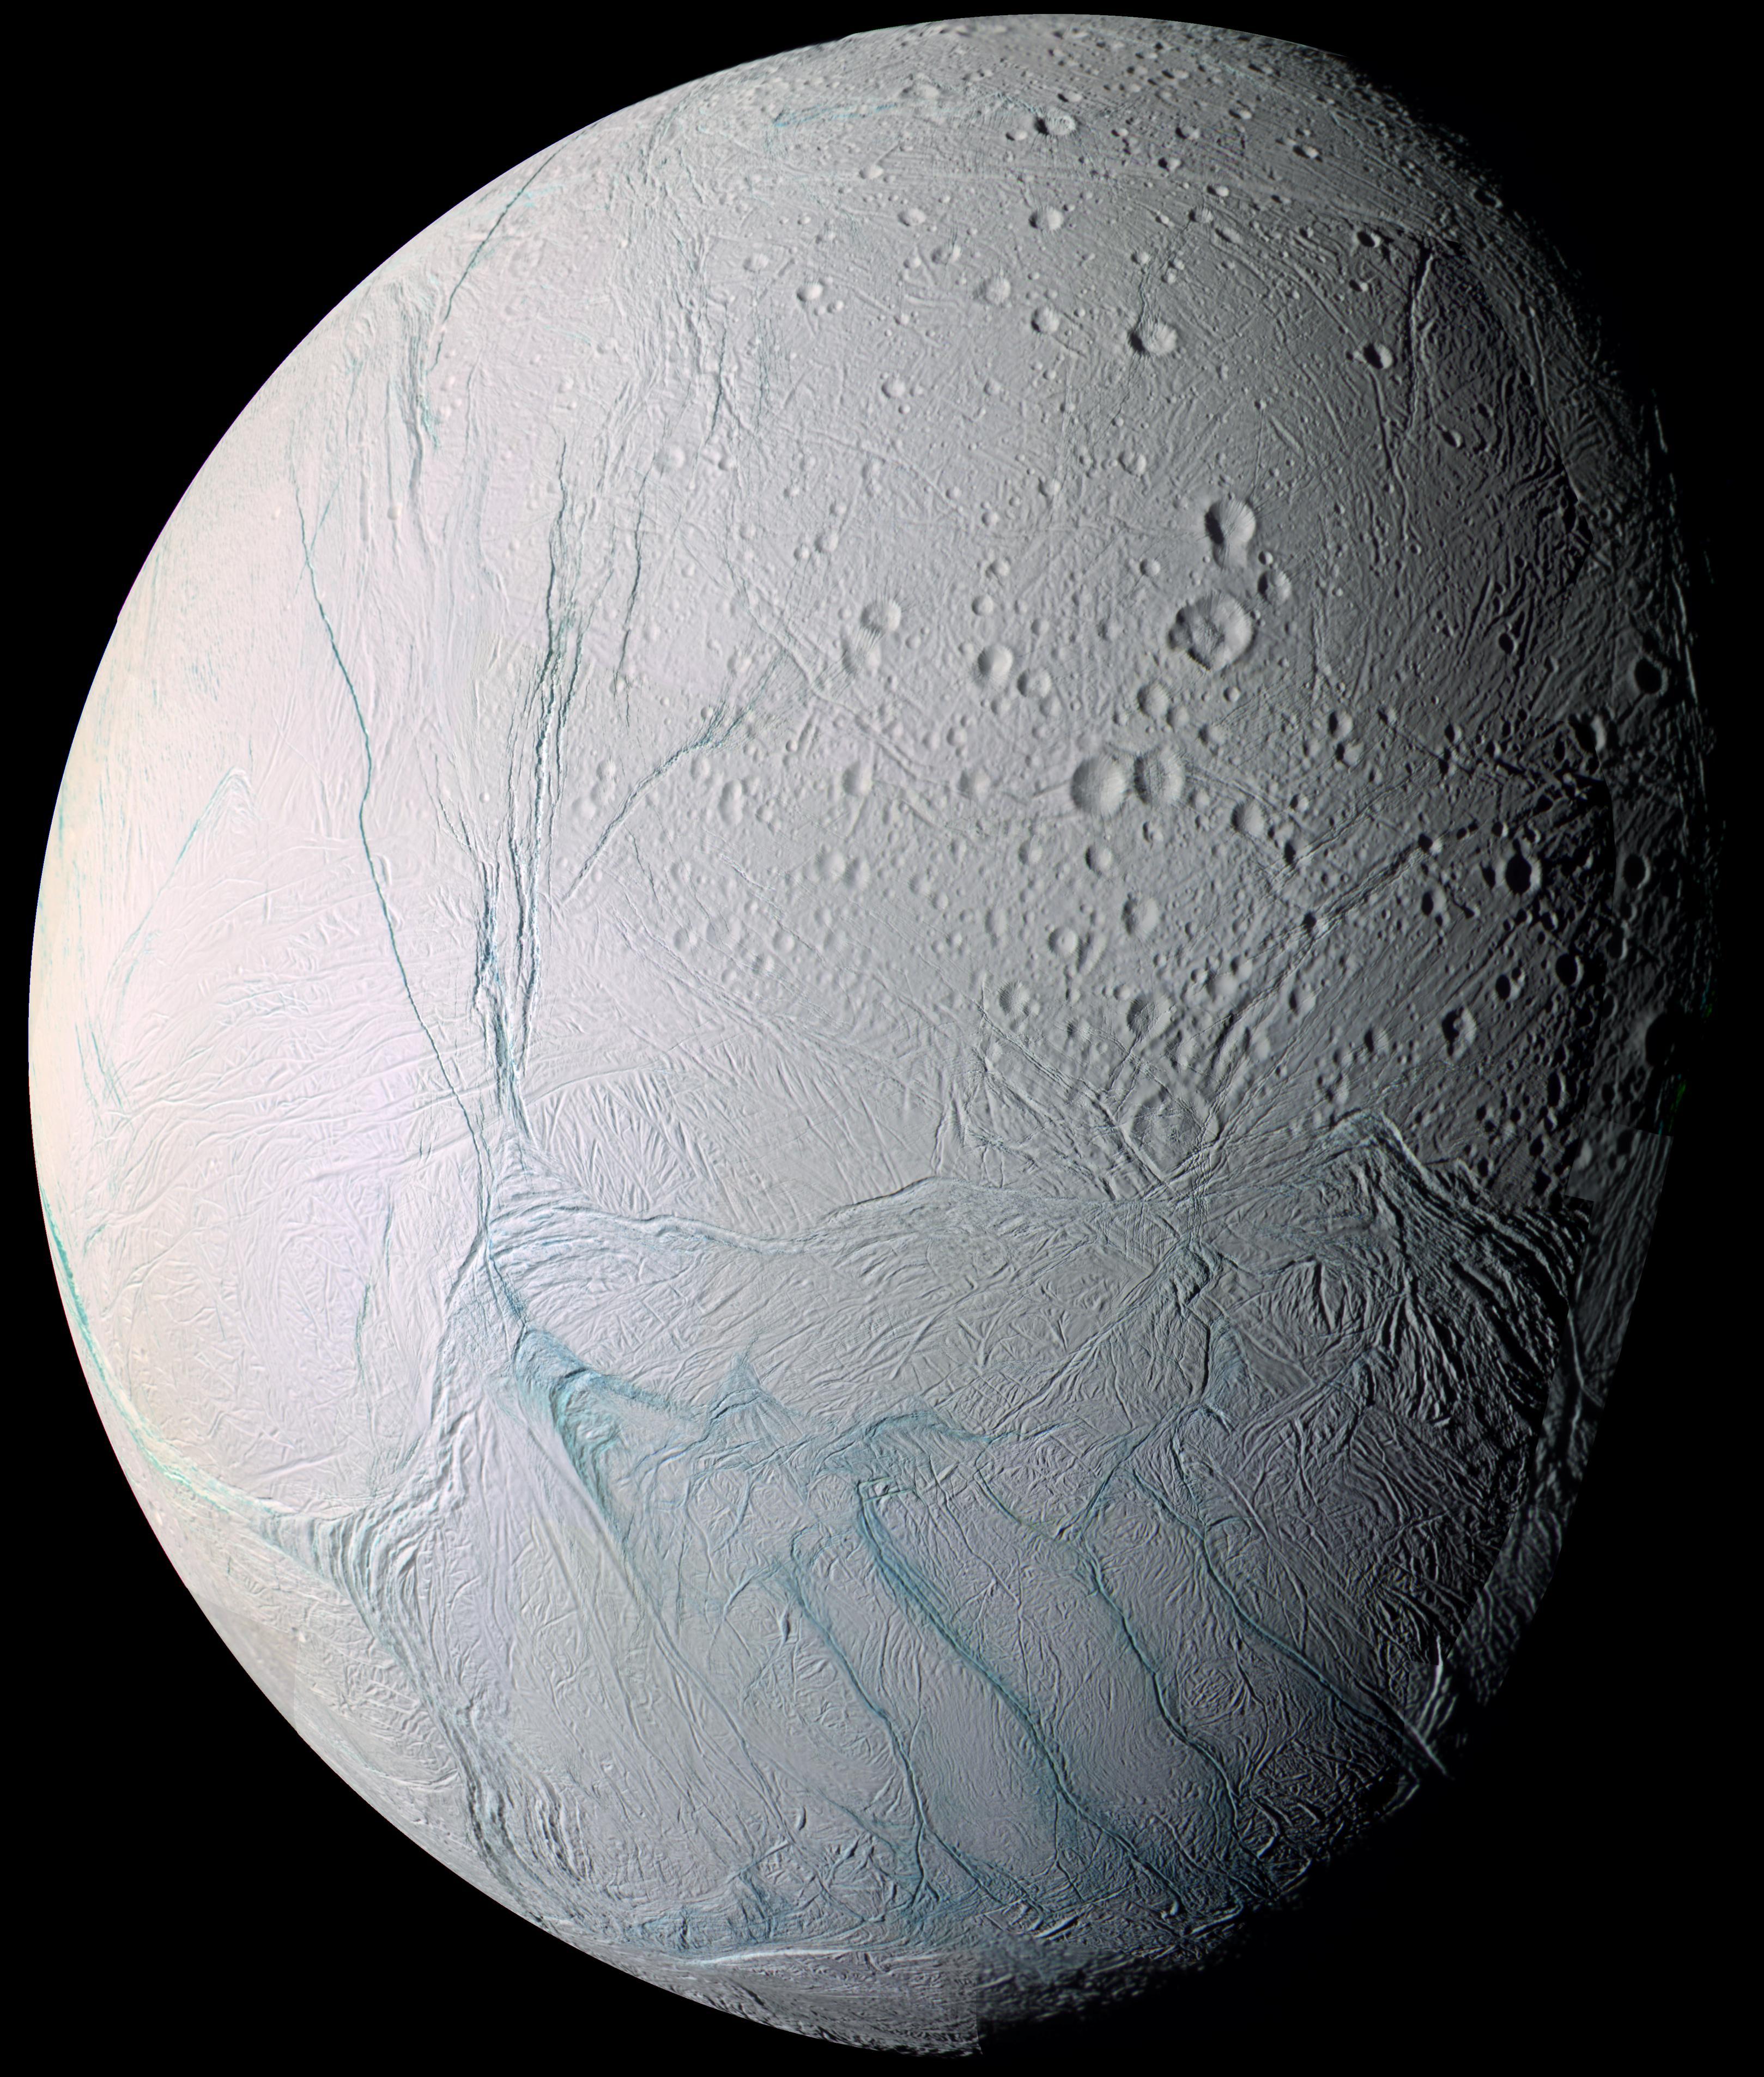 Enceladus [3237x3812]